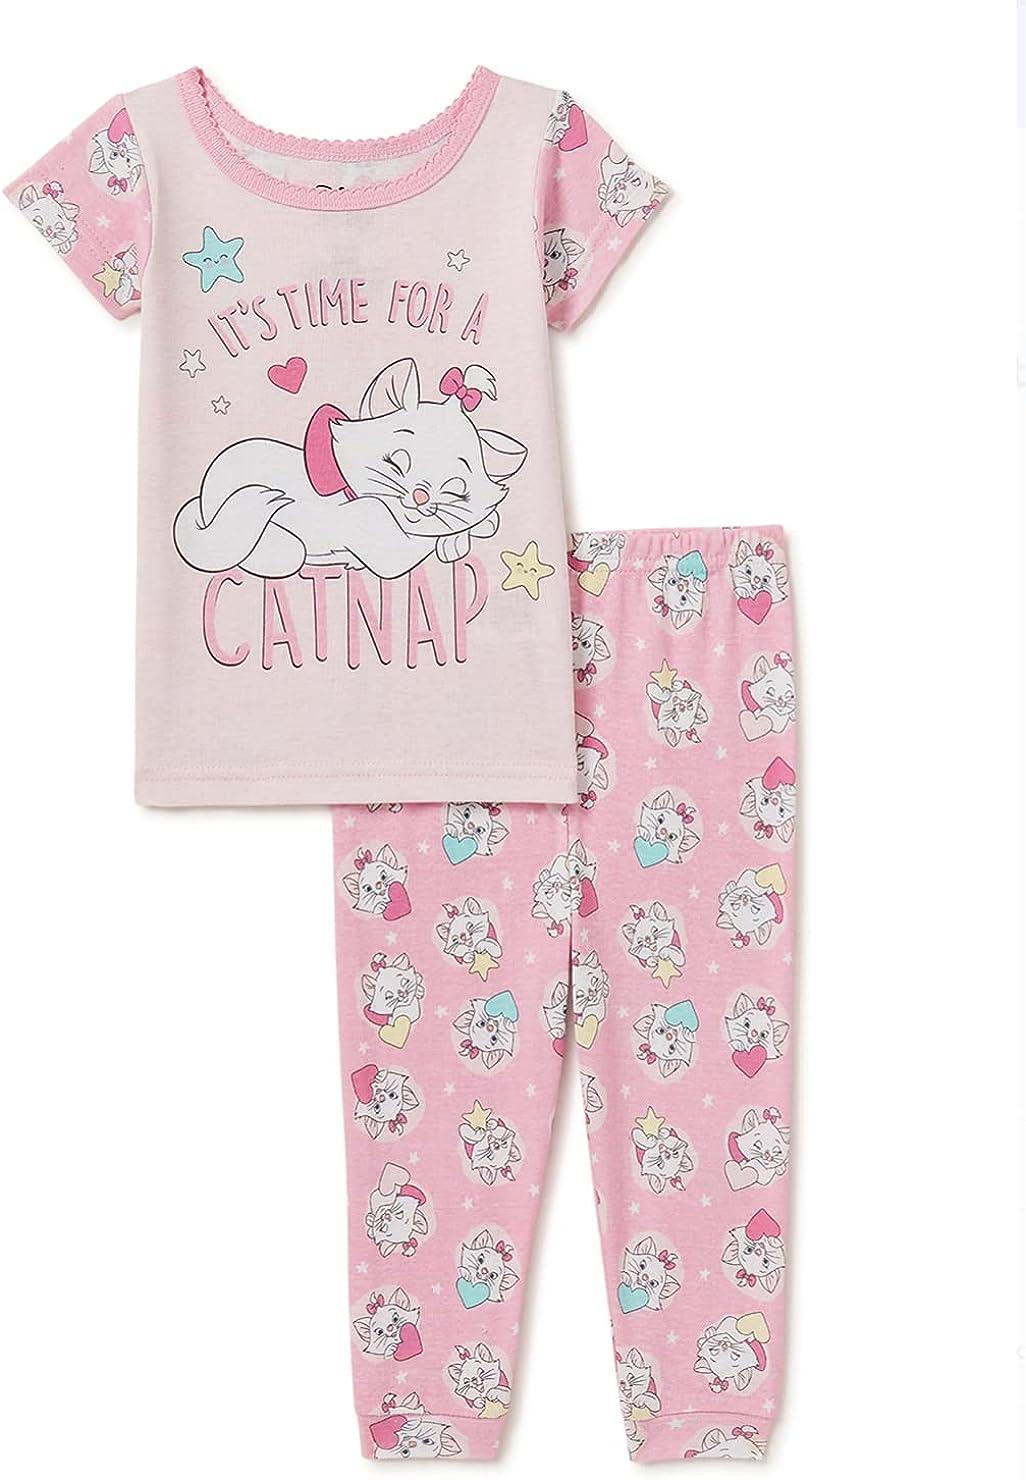 Disney Baby Girl's Marie Cotton Pajamas Short Sleeve Snug Fit, 2-Piece Set